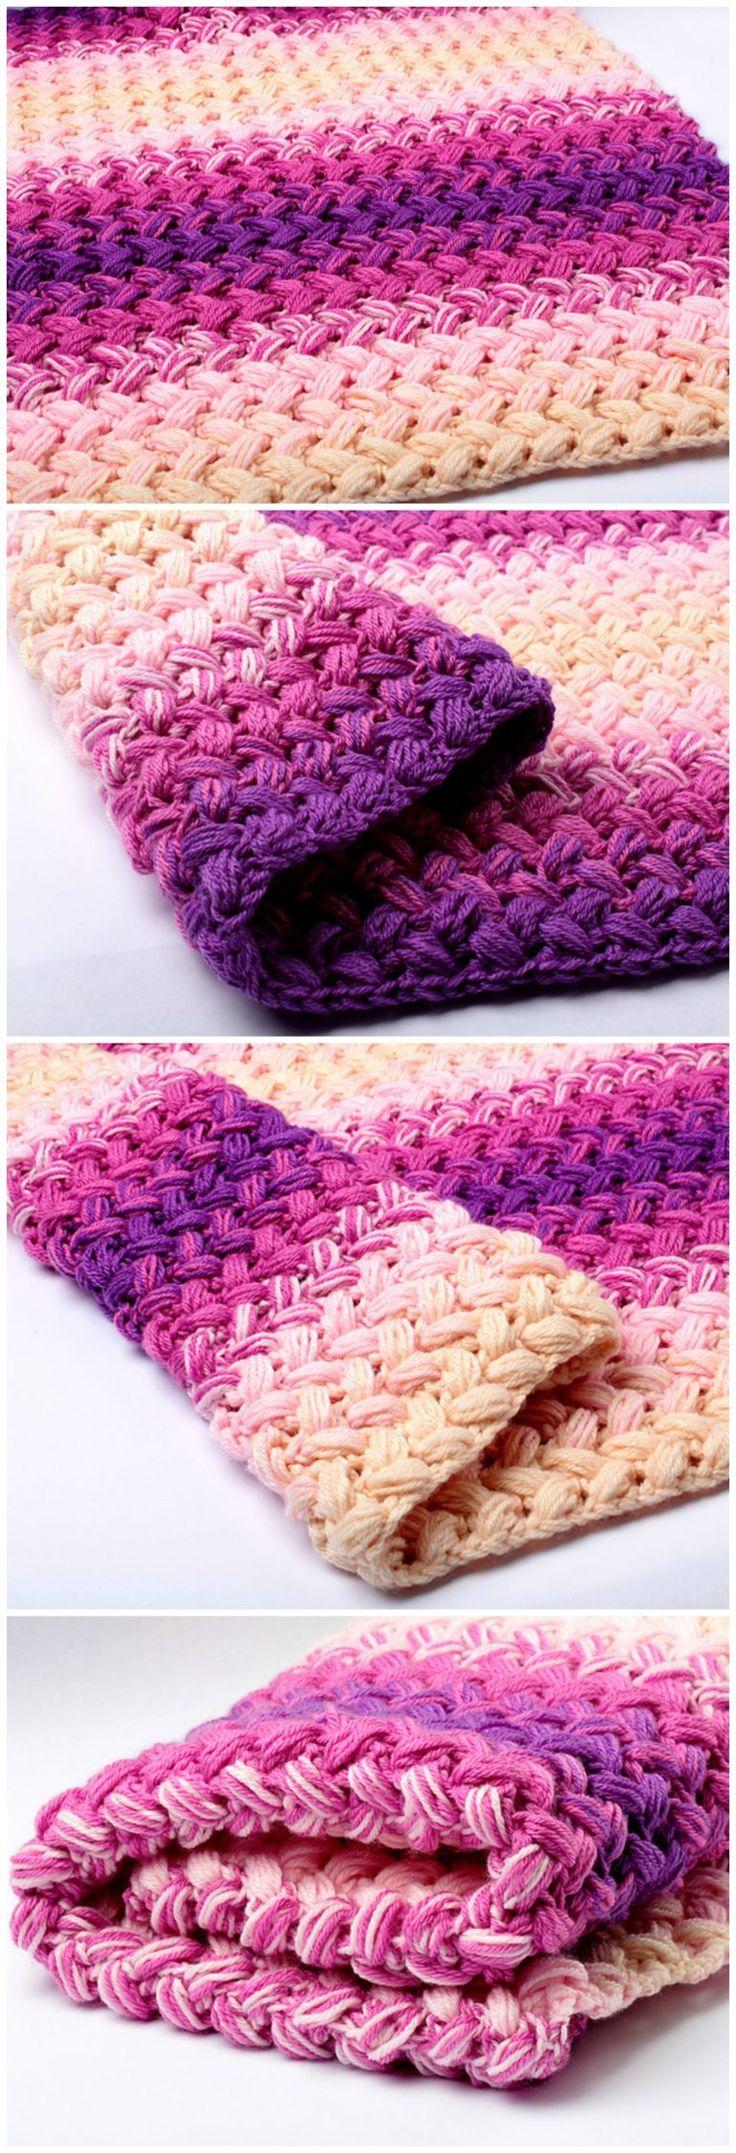 http://pretty-ideas.com/crochet-zig-zag-blanket/